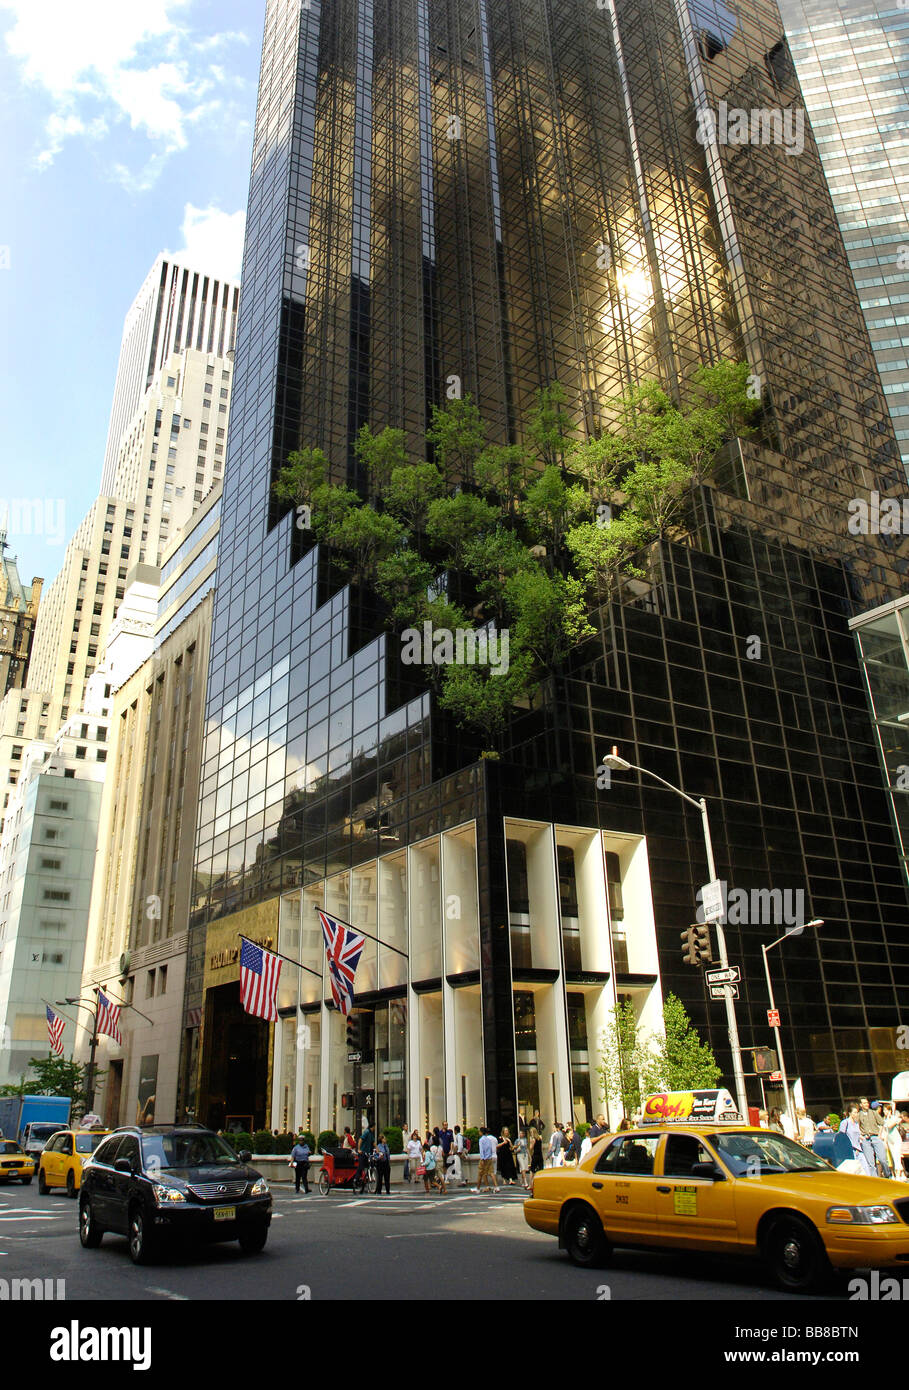 Trump Tower New York Address Trump Tower New York Address